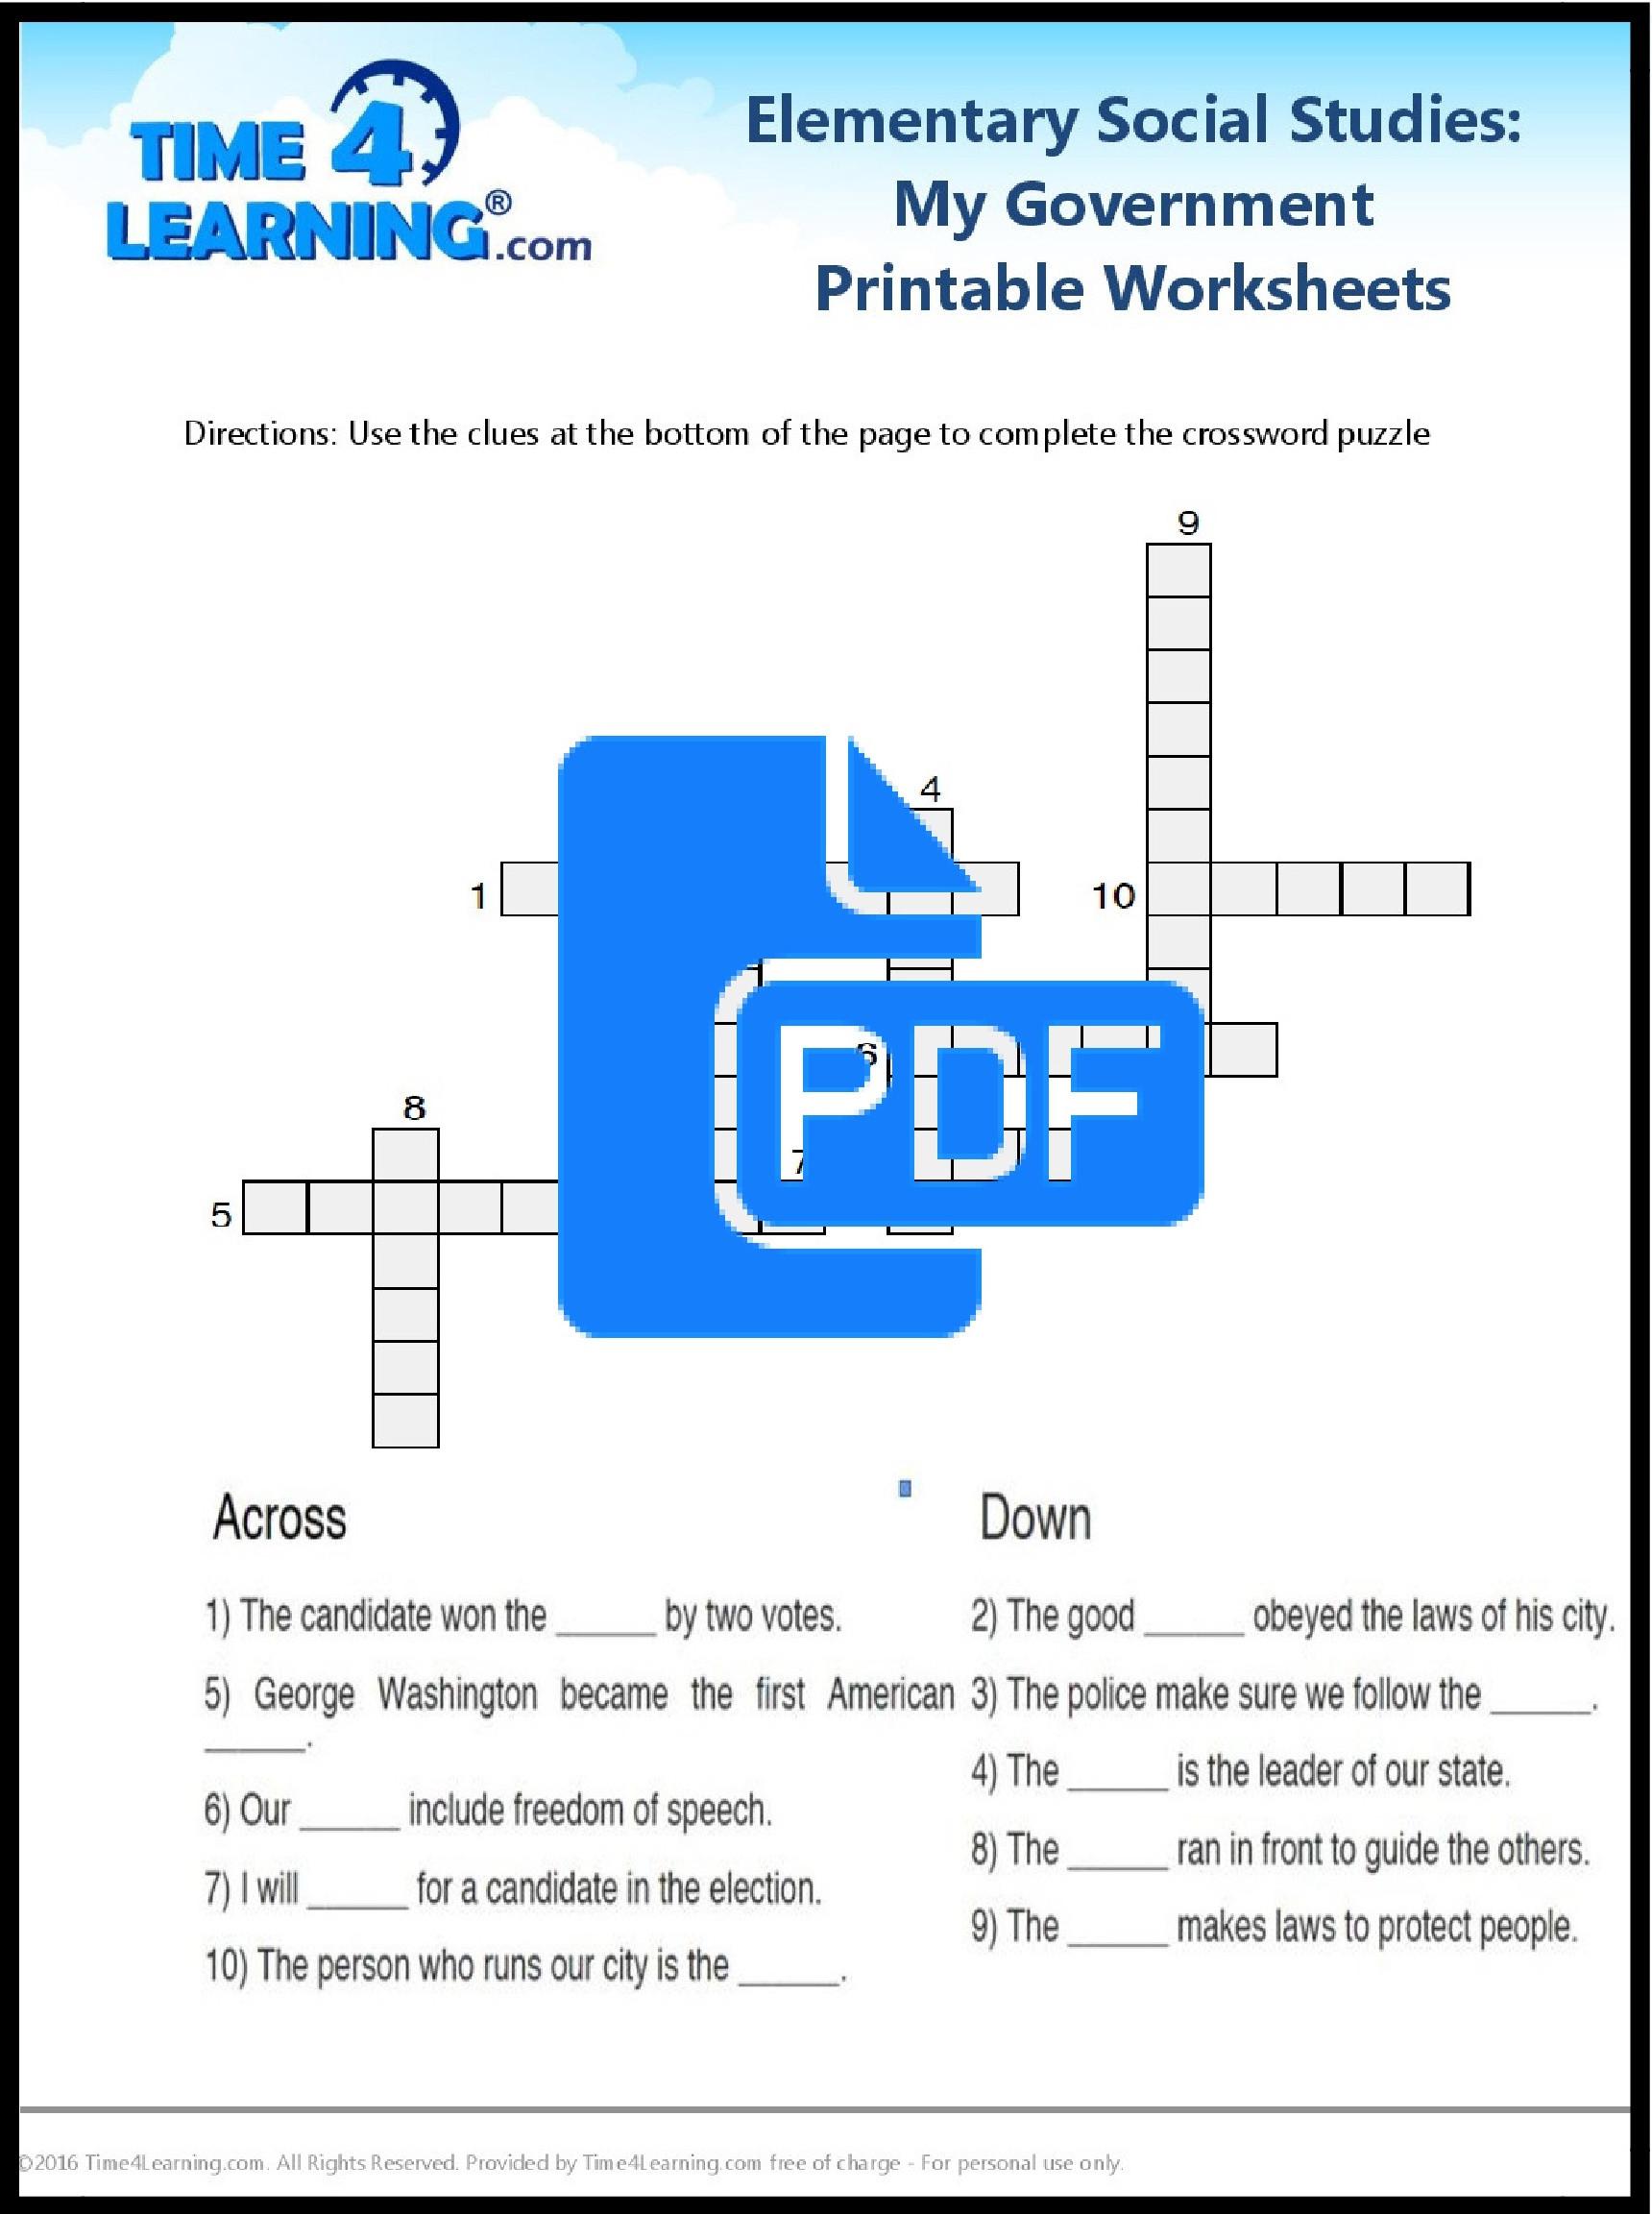 7th Grade Geography Worksheets Free Printable Elementary social Stu S Worksheet